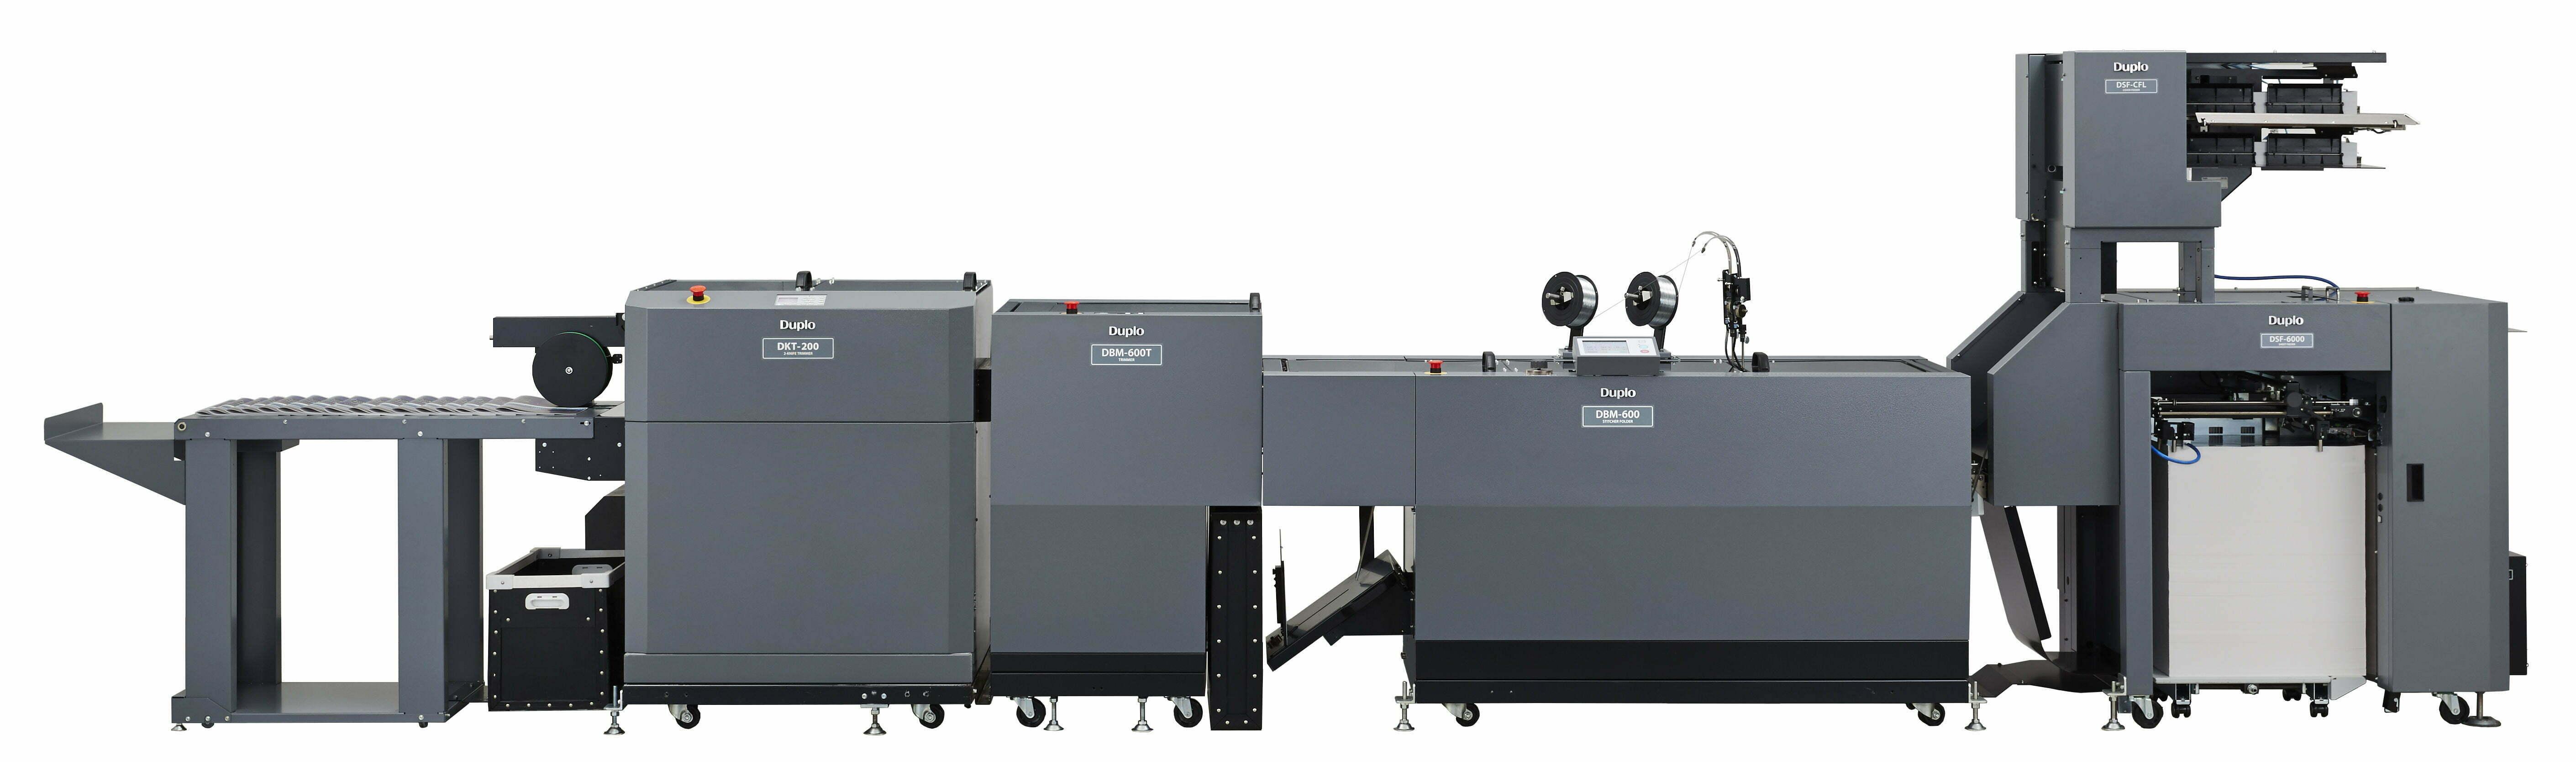 Duplo 600 Pro Digital Booklet System Vouwhechtsysteem